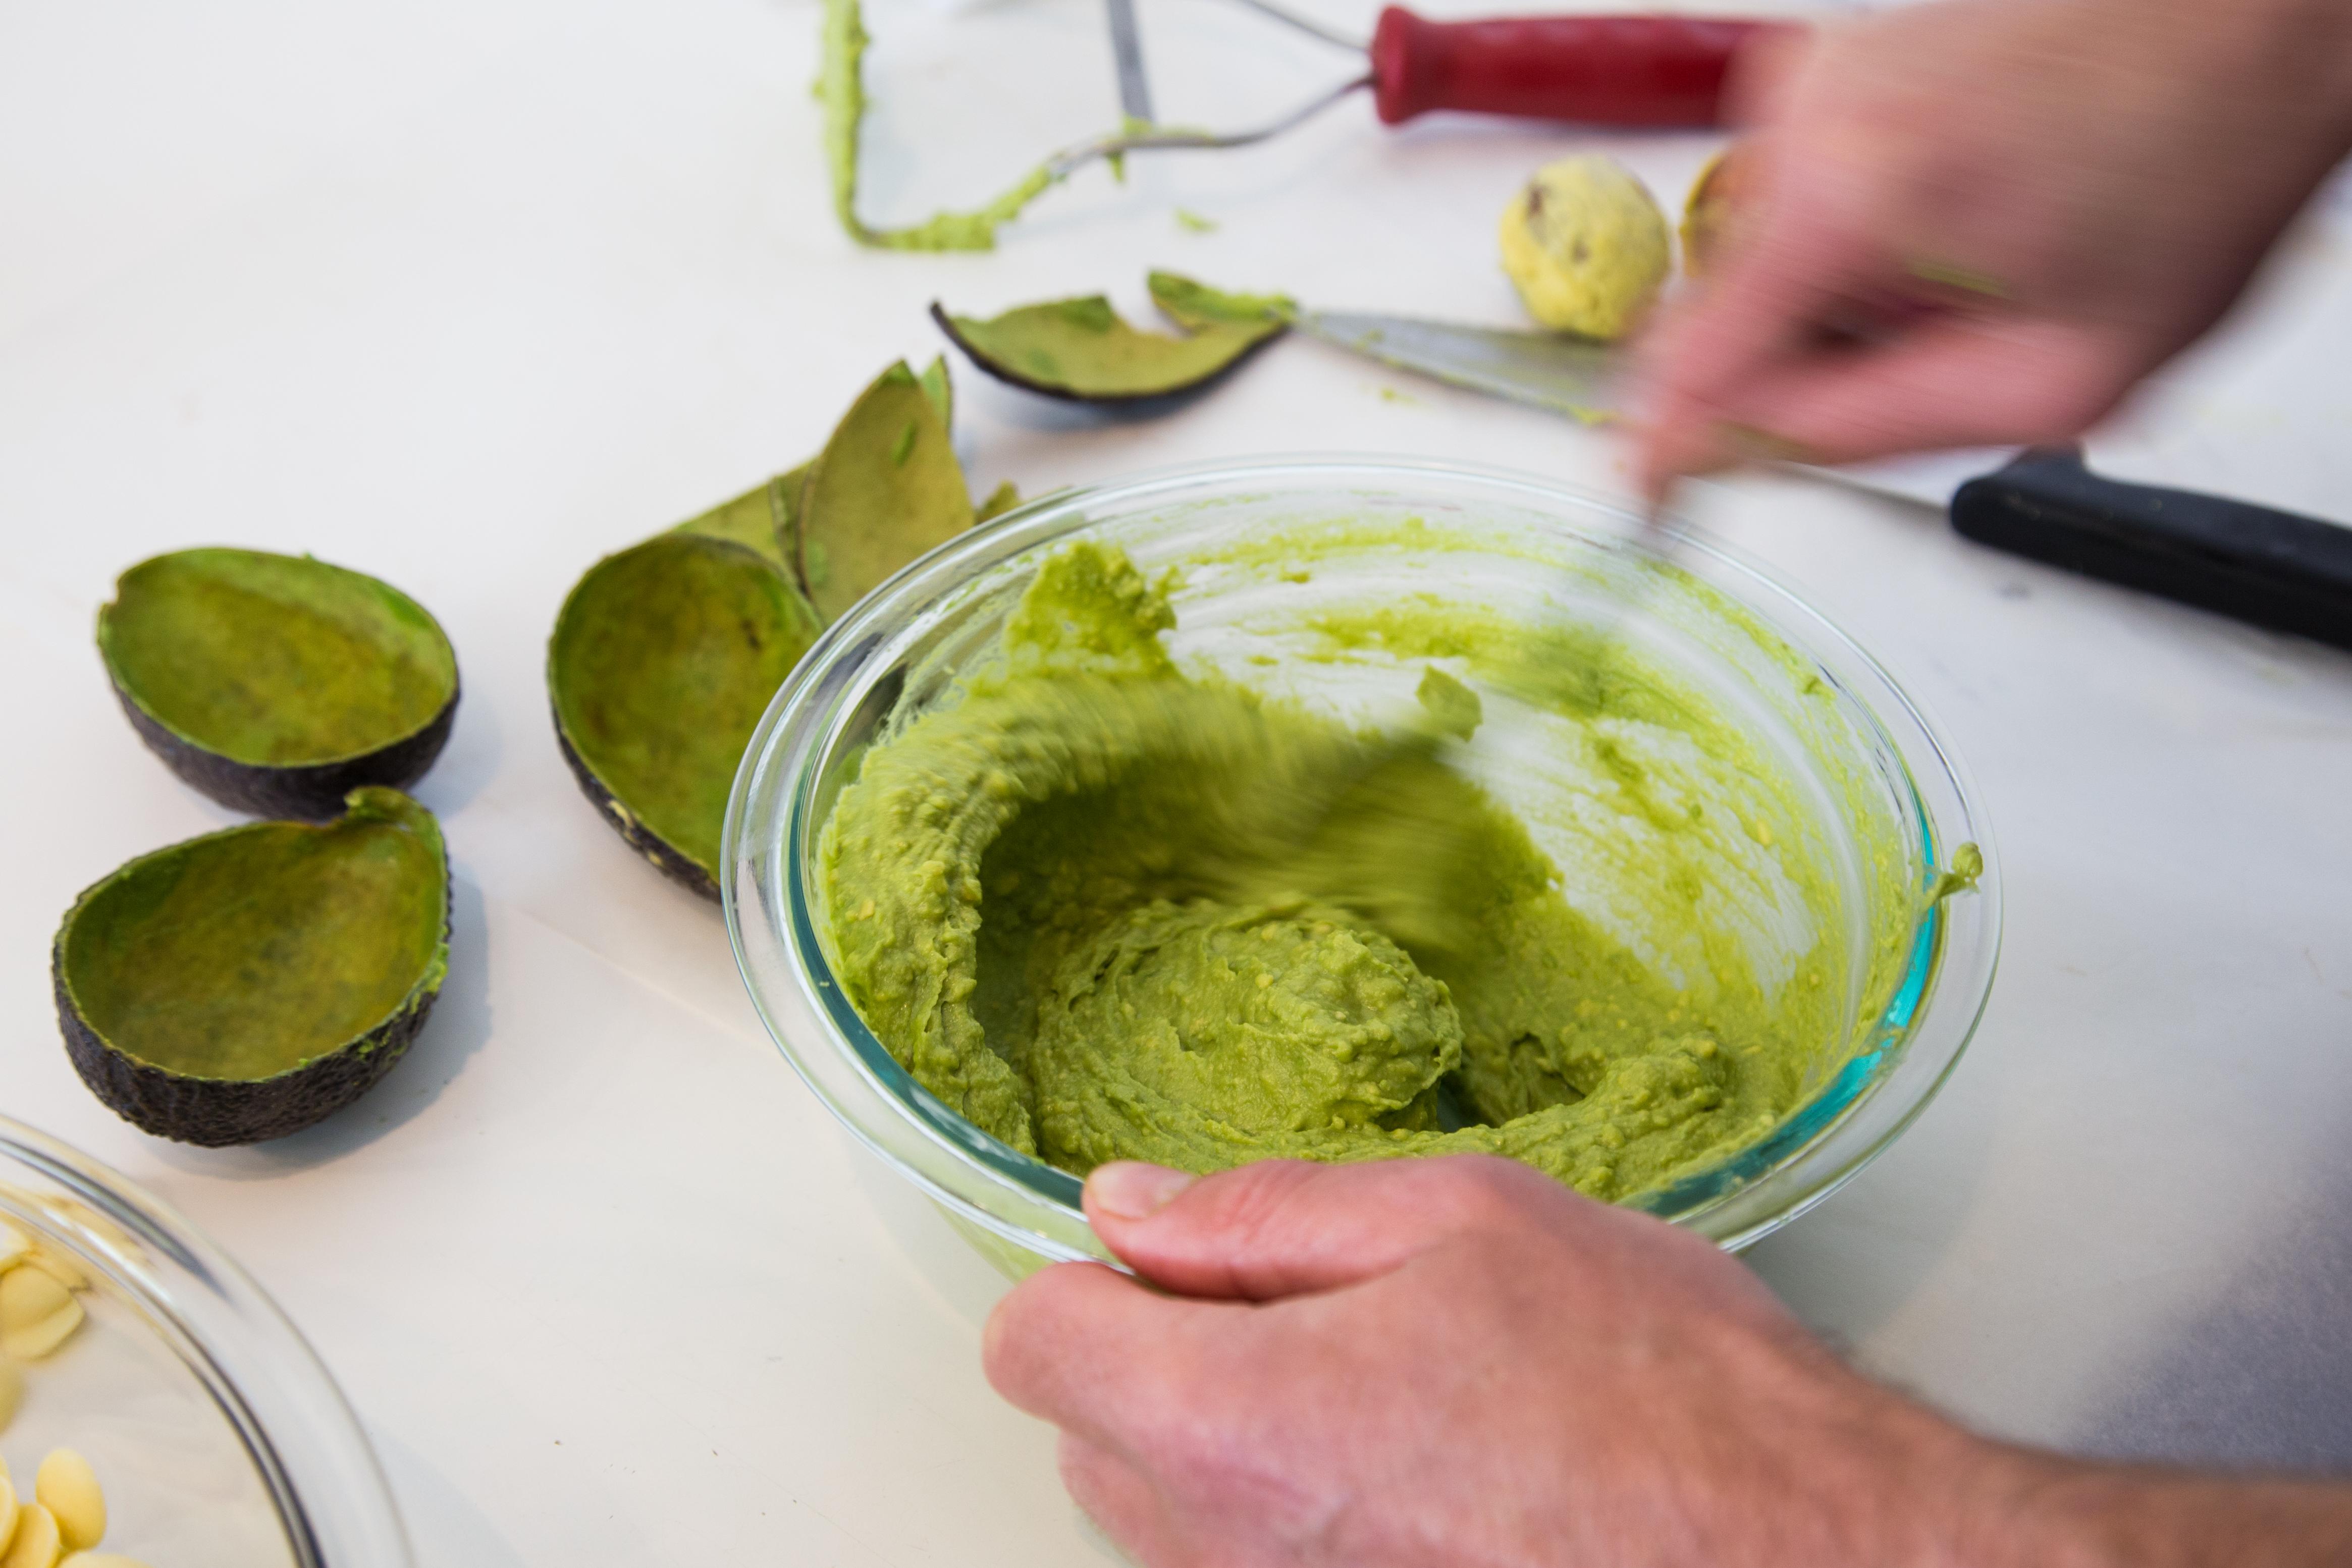 Cut, scoop and mash California avocados